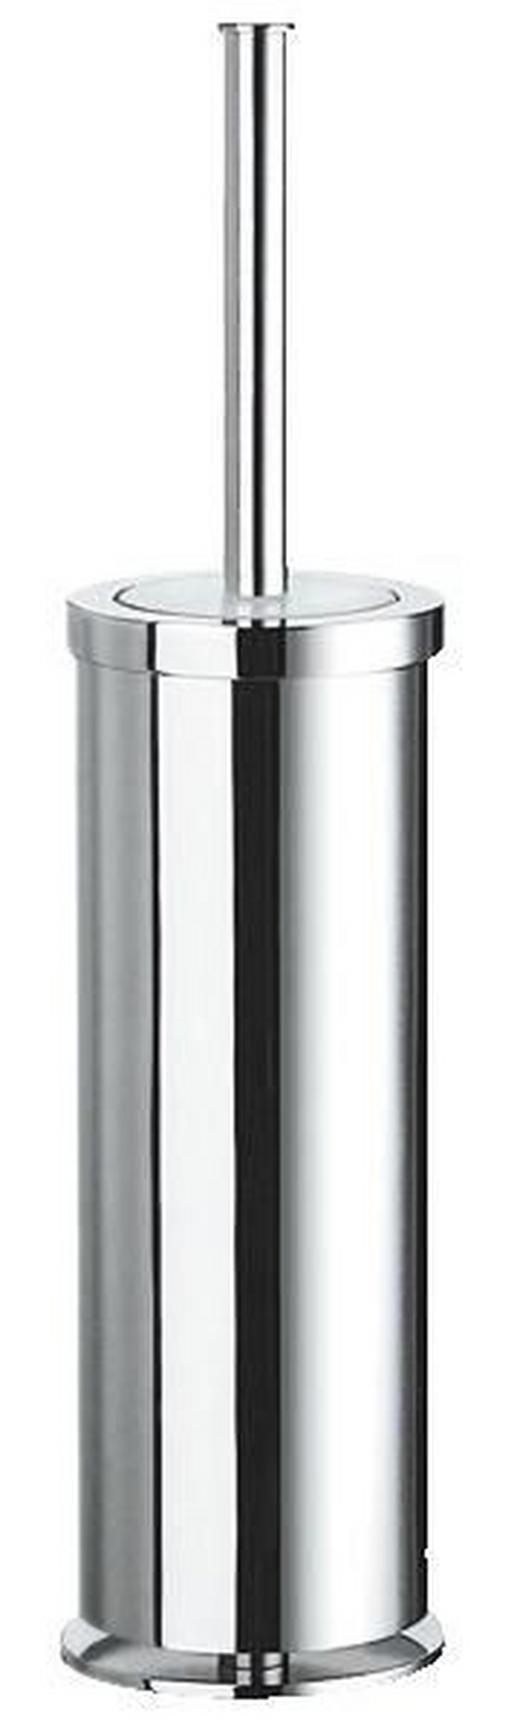 WC-BÜRSTENGARNITUR in Glas, Metall - Chromfarben, Basics, Glas/Kunststoff (9,5/41cm)